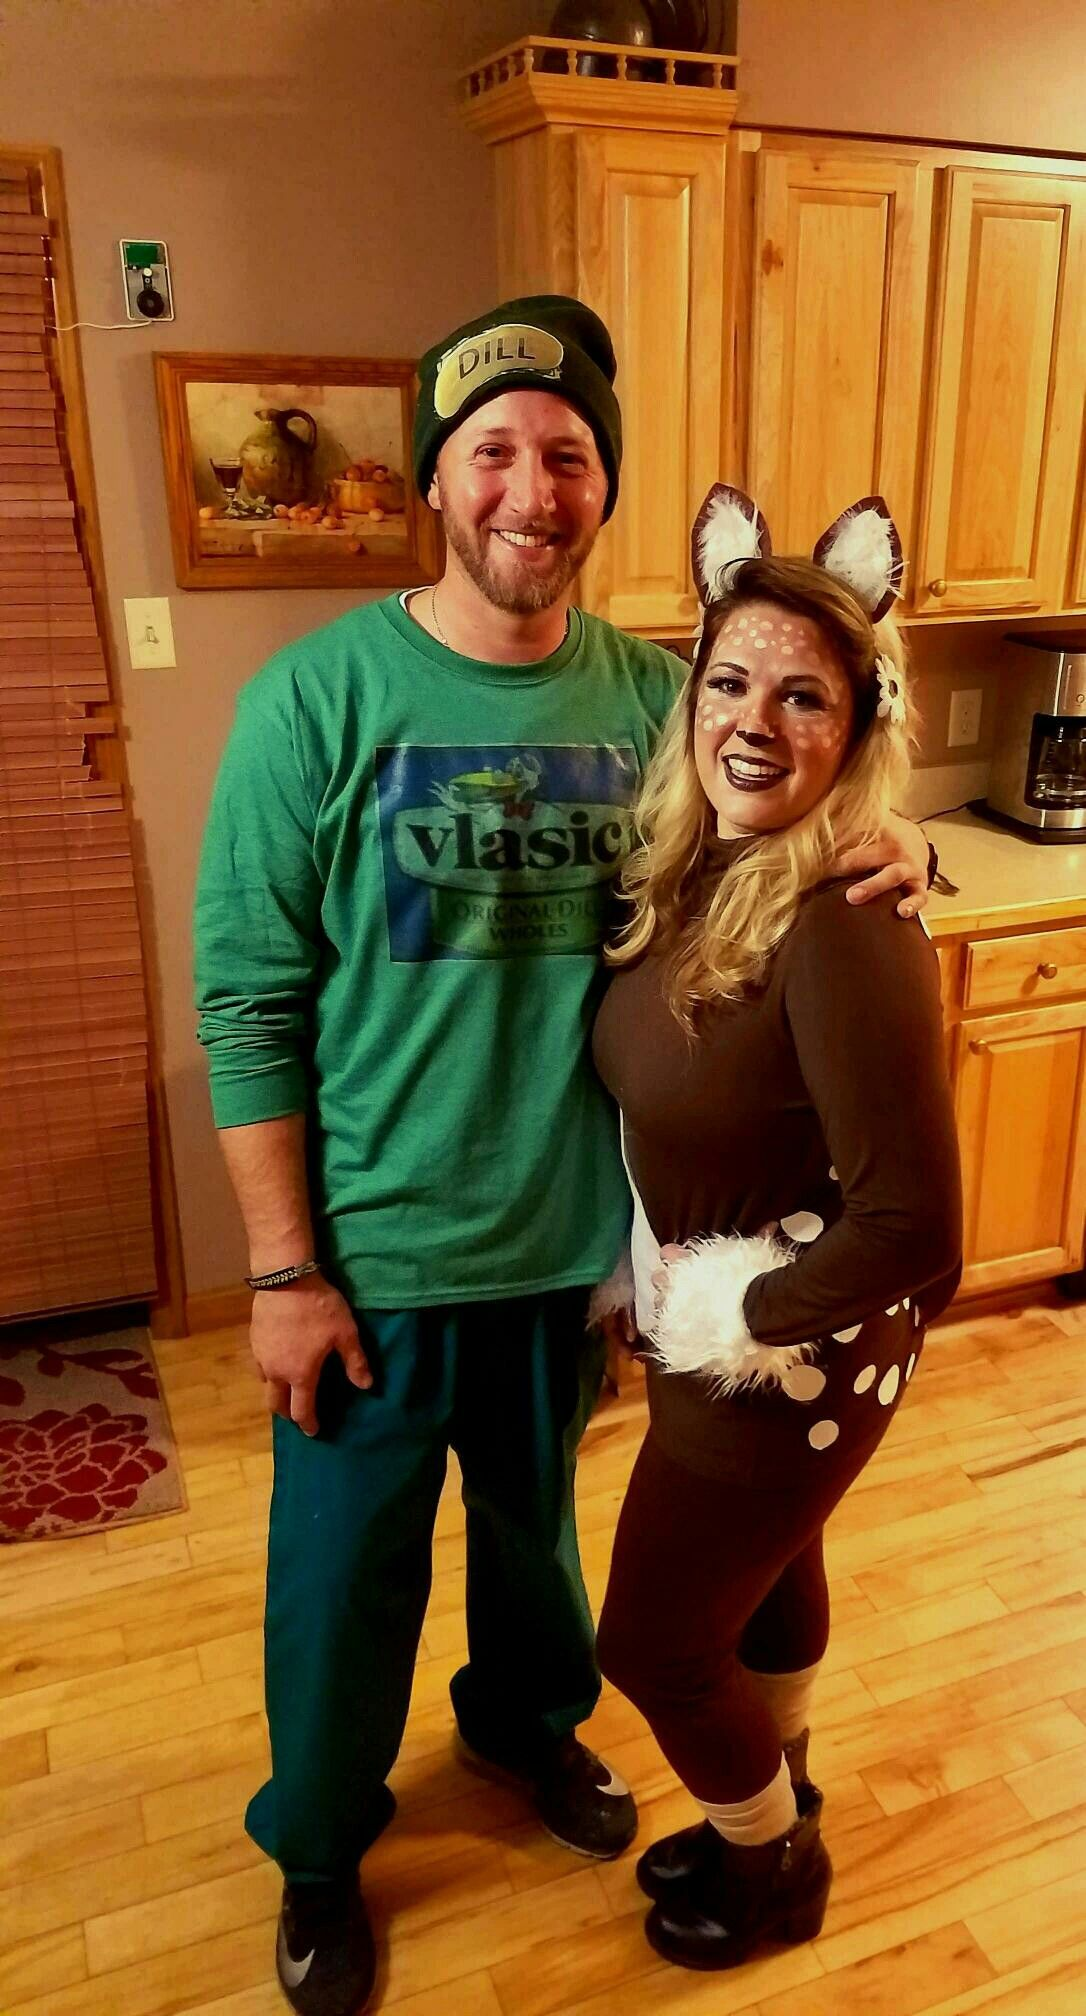 ee48686ab3 Dill-Doe Costume | Halloween | Pickle costume, Couple halloween ...